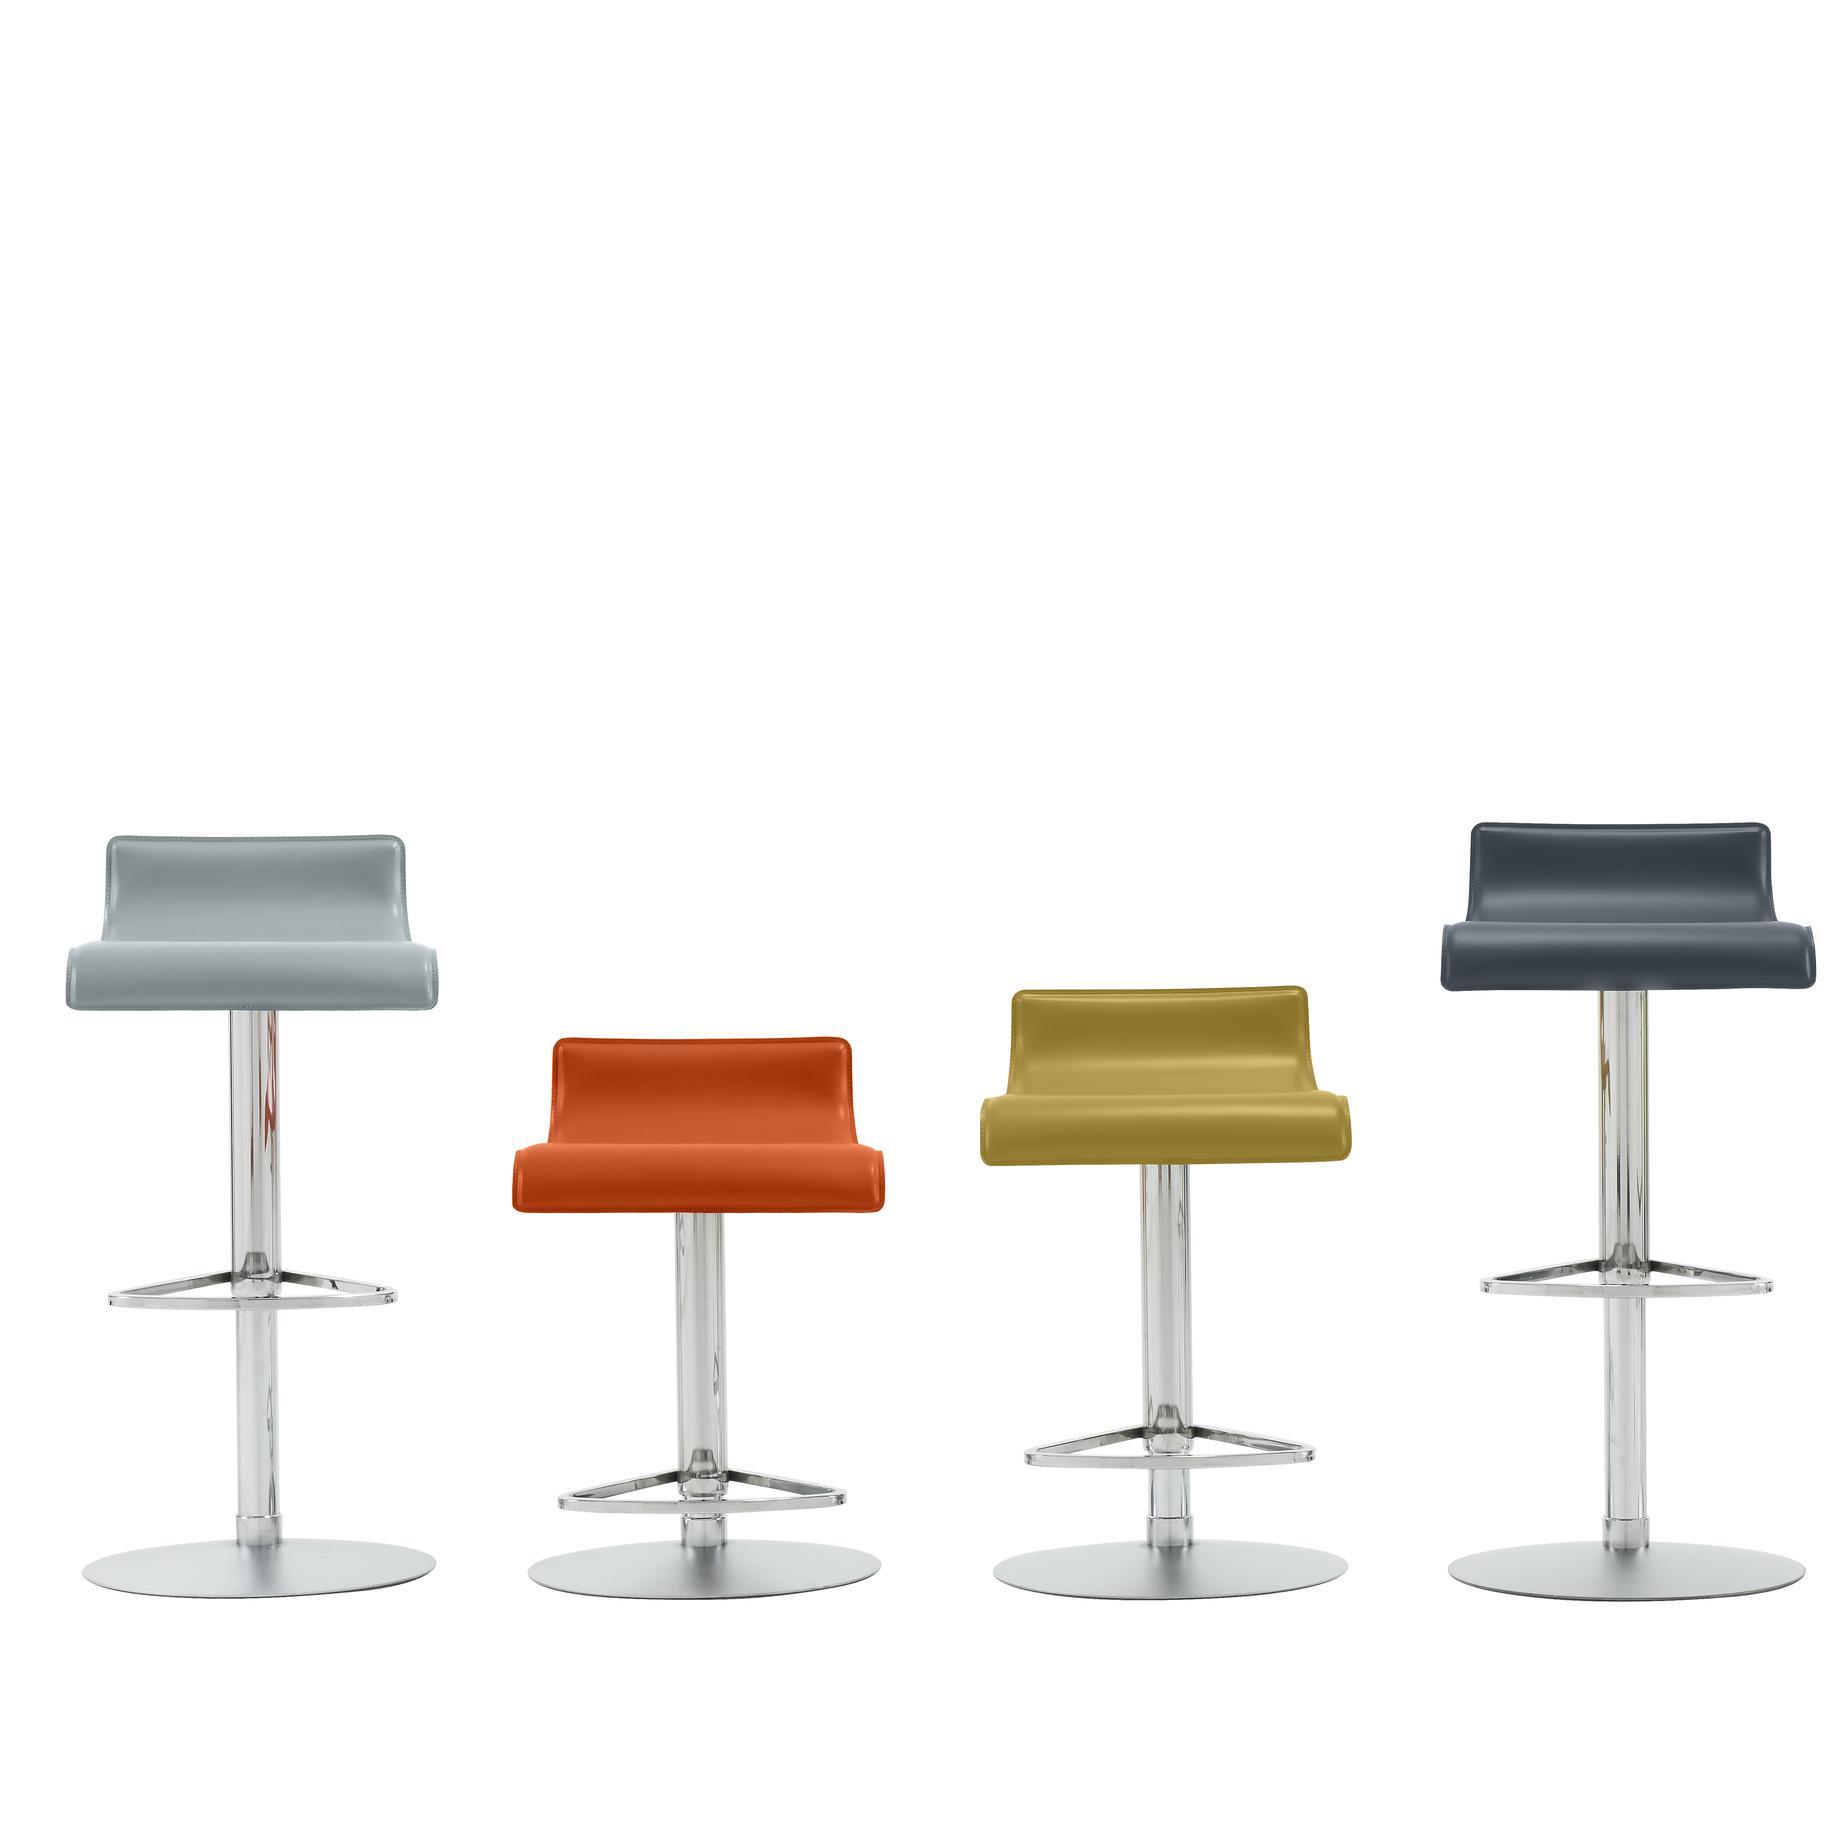 pam chairs designer claudio dondoli marco pocci ligne roset. Black Bedroom Furniture Sets. Home Design Ideas